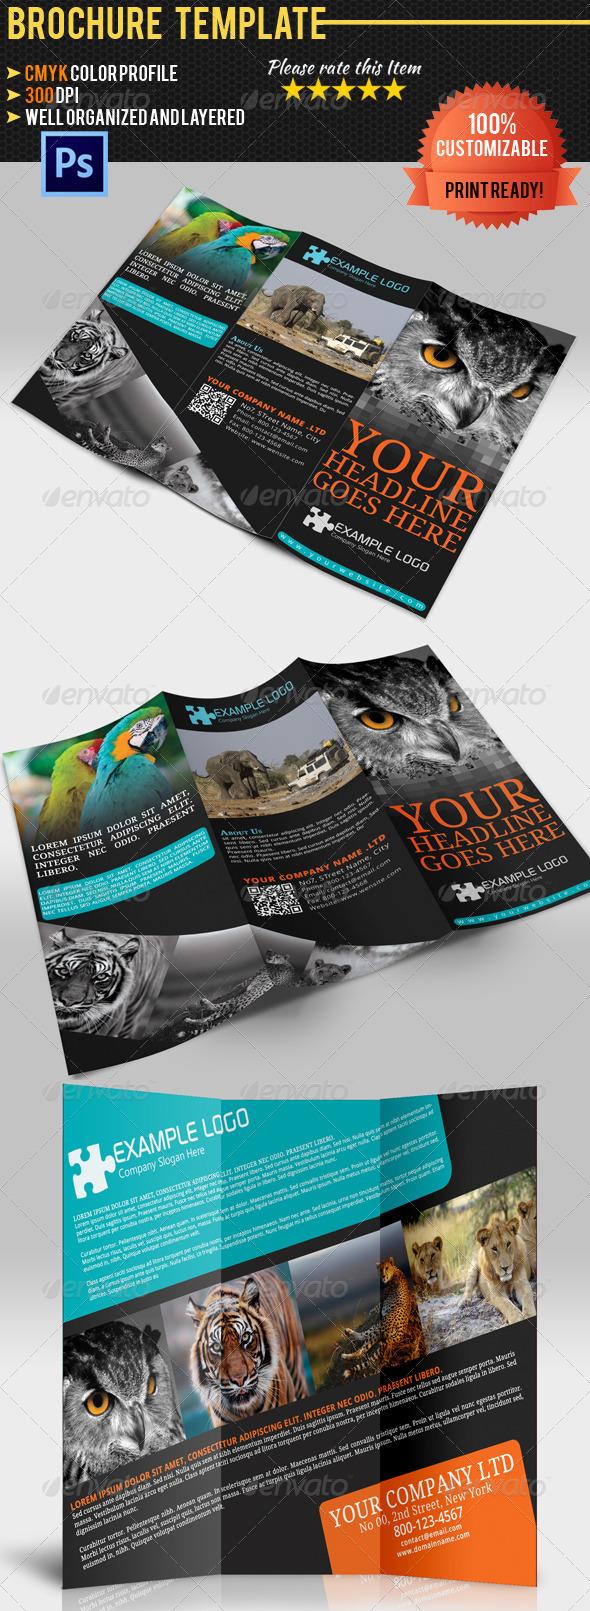 Adventure Travel Brochure Templatre - Brochures Print Templates